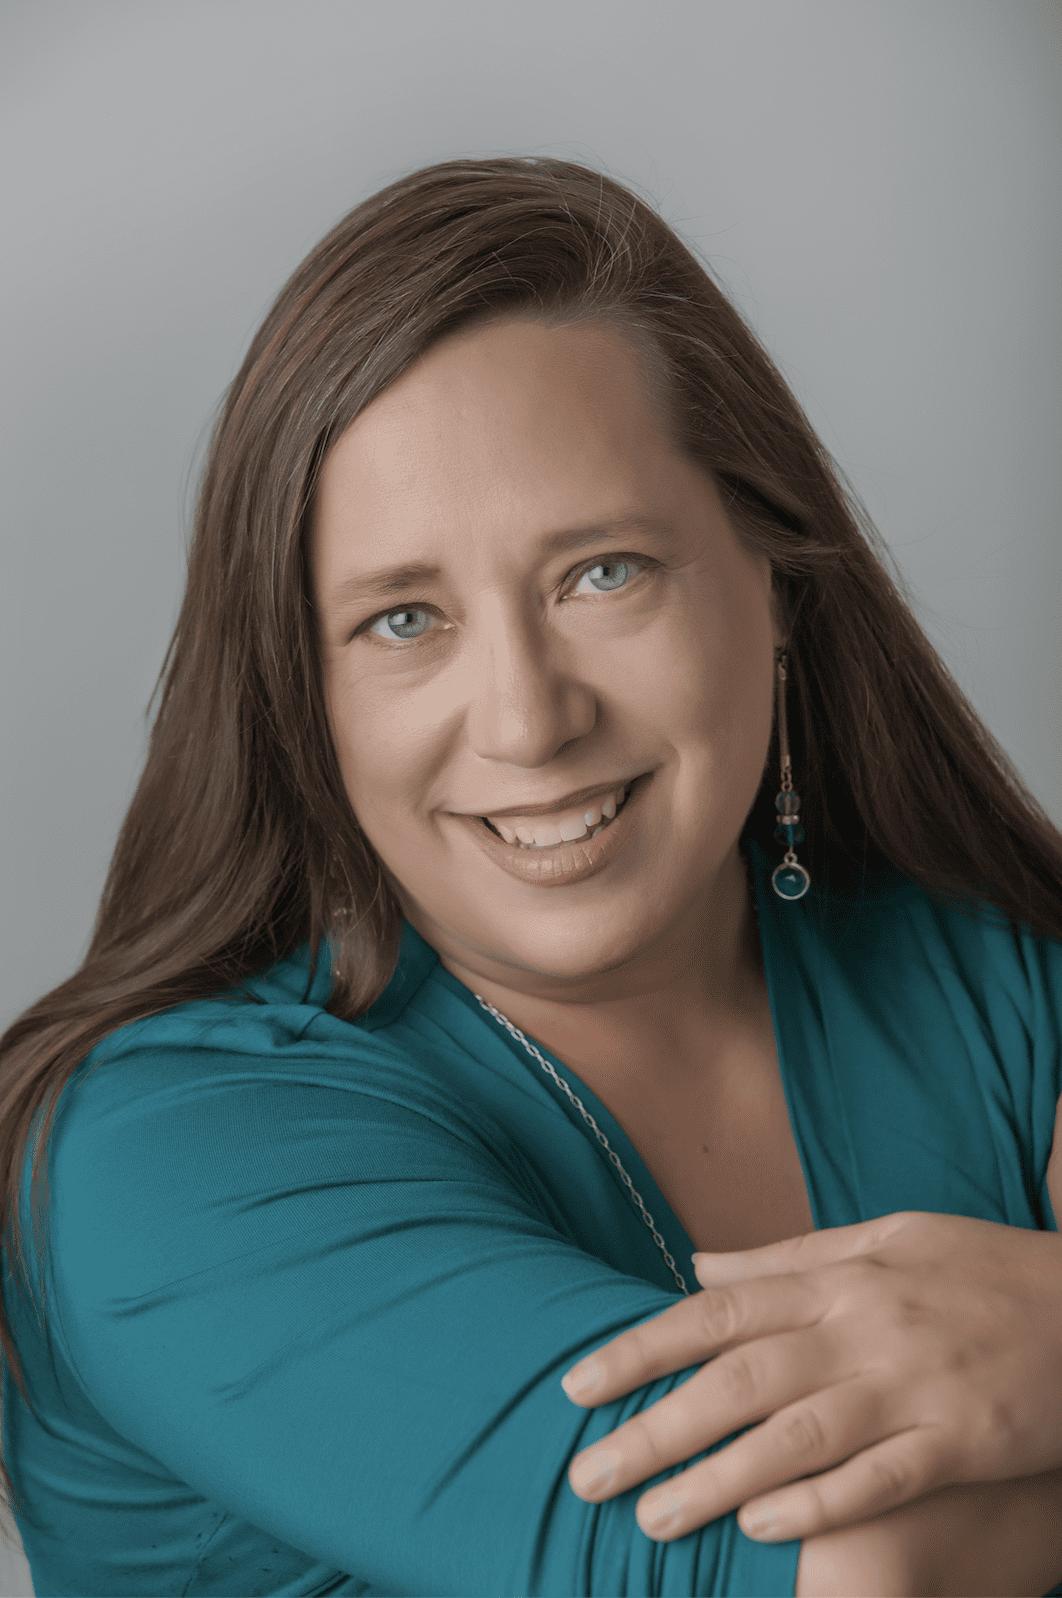 Headshot of a woman, Michele Reber, wearing a blue shirt